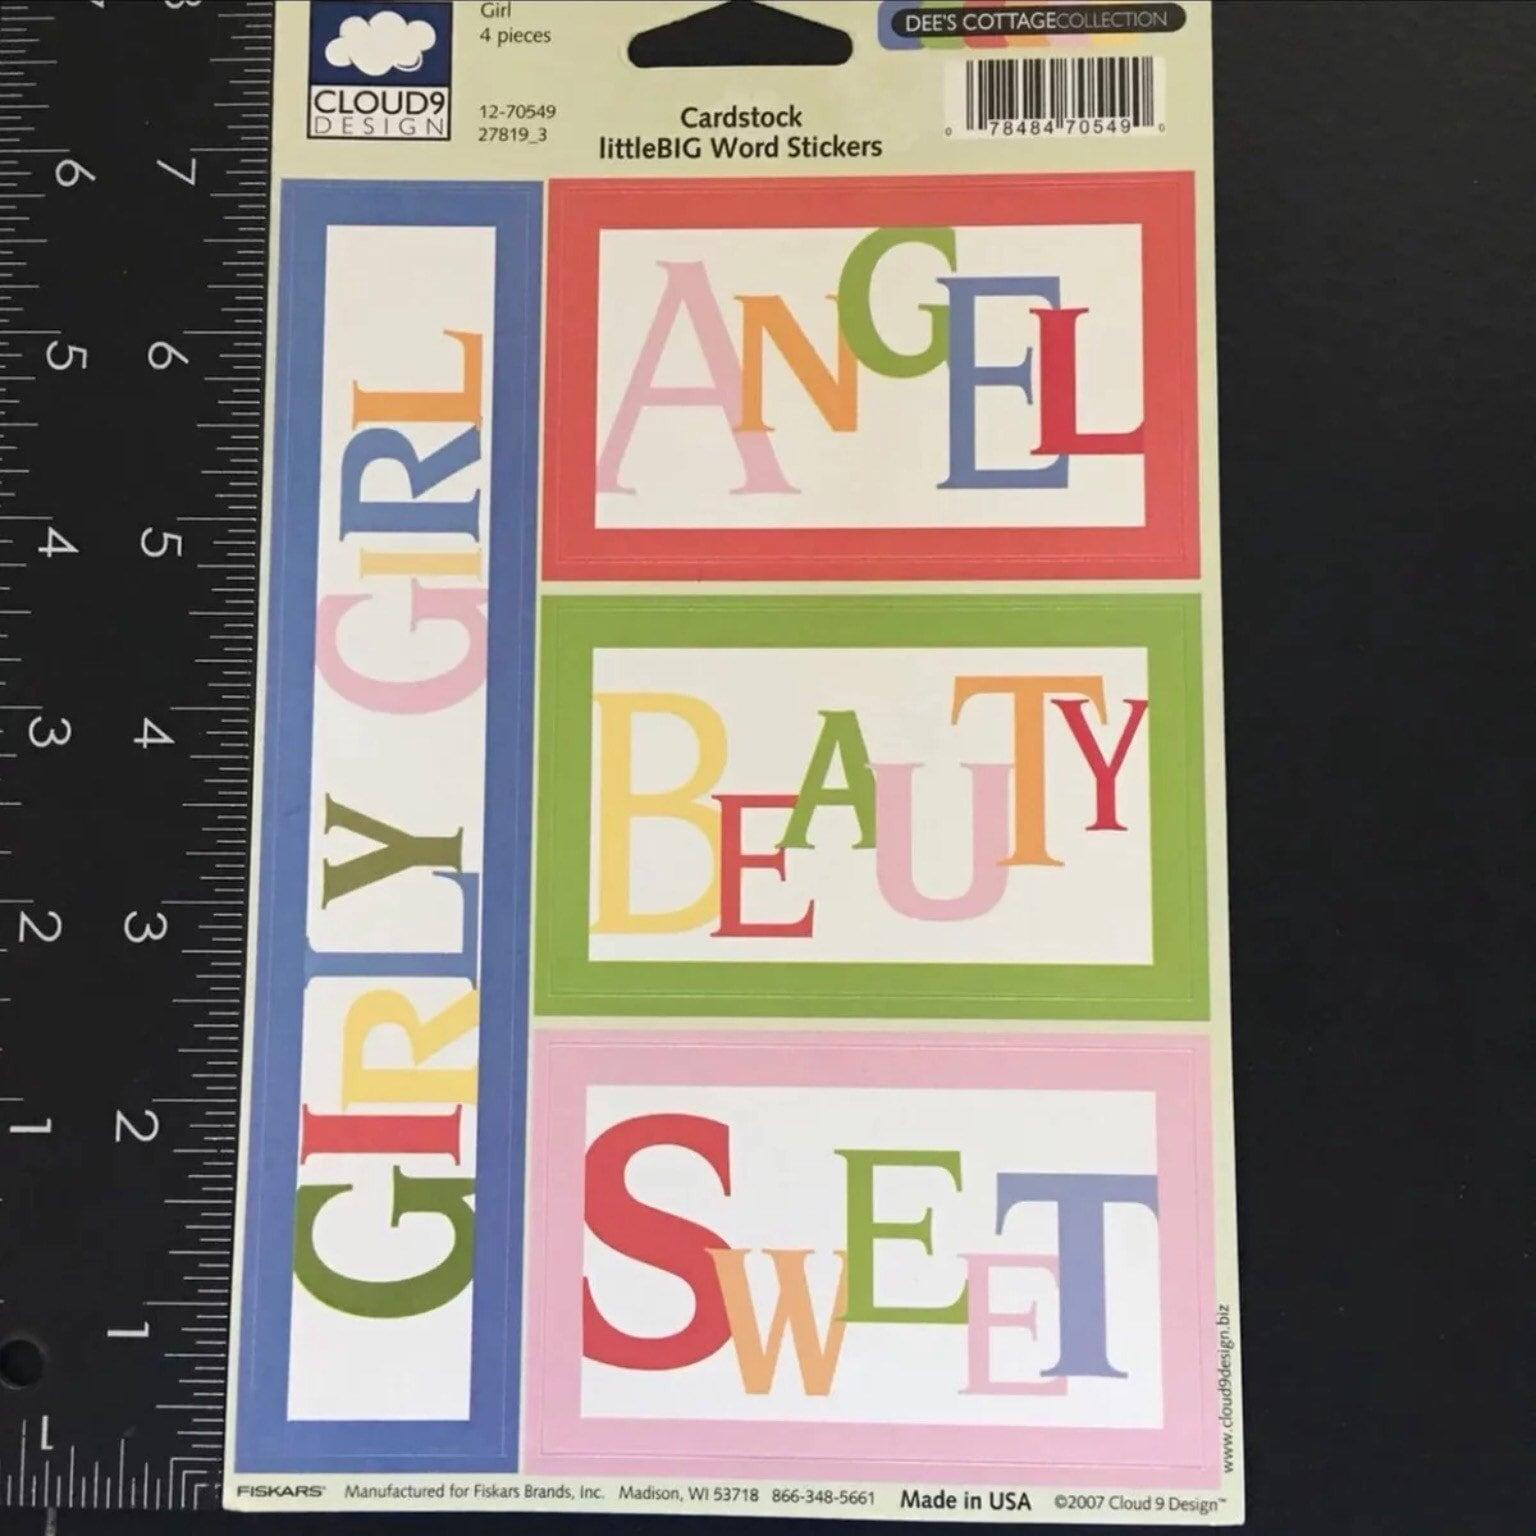 Dees Cottage Collection Girl Angel Cardstock Littlebig Word